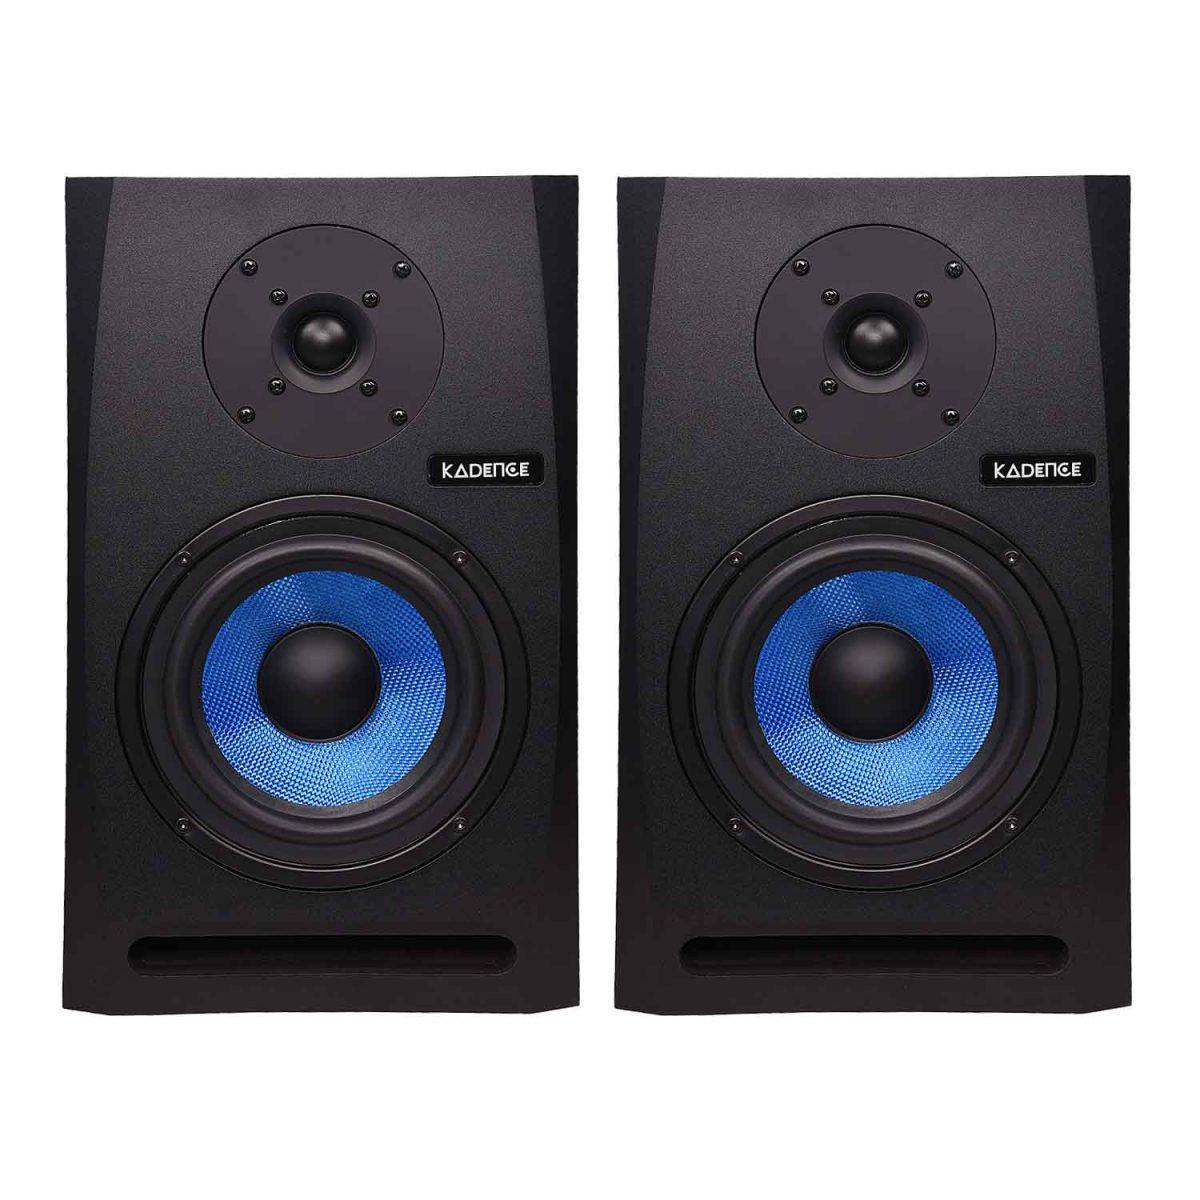 "Kadence M Series 6"" 2-way near-field studio reference monitors"